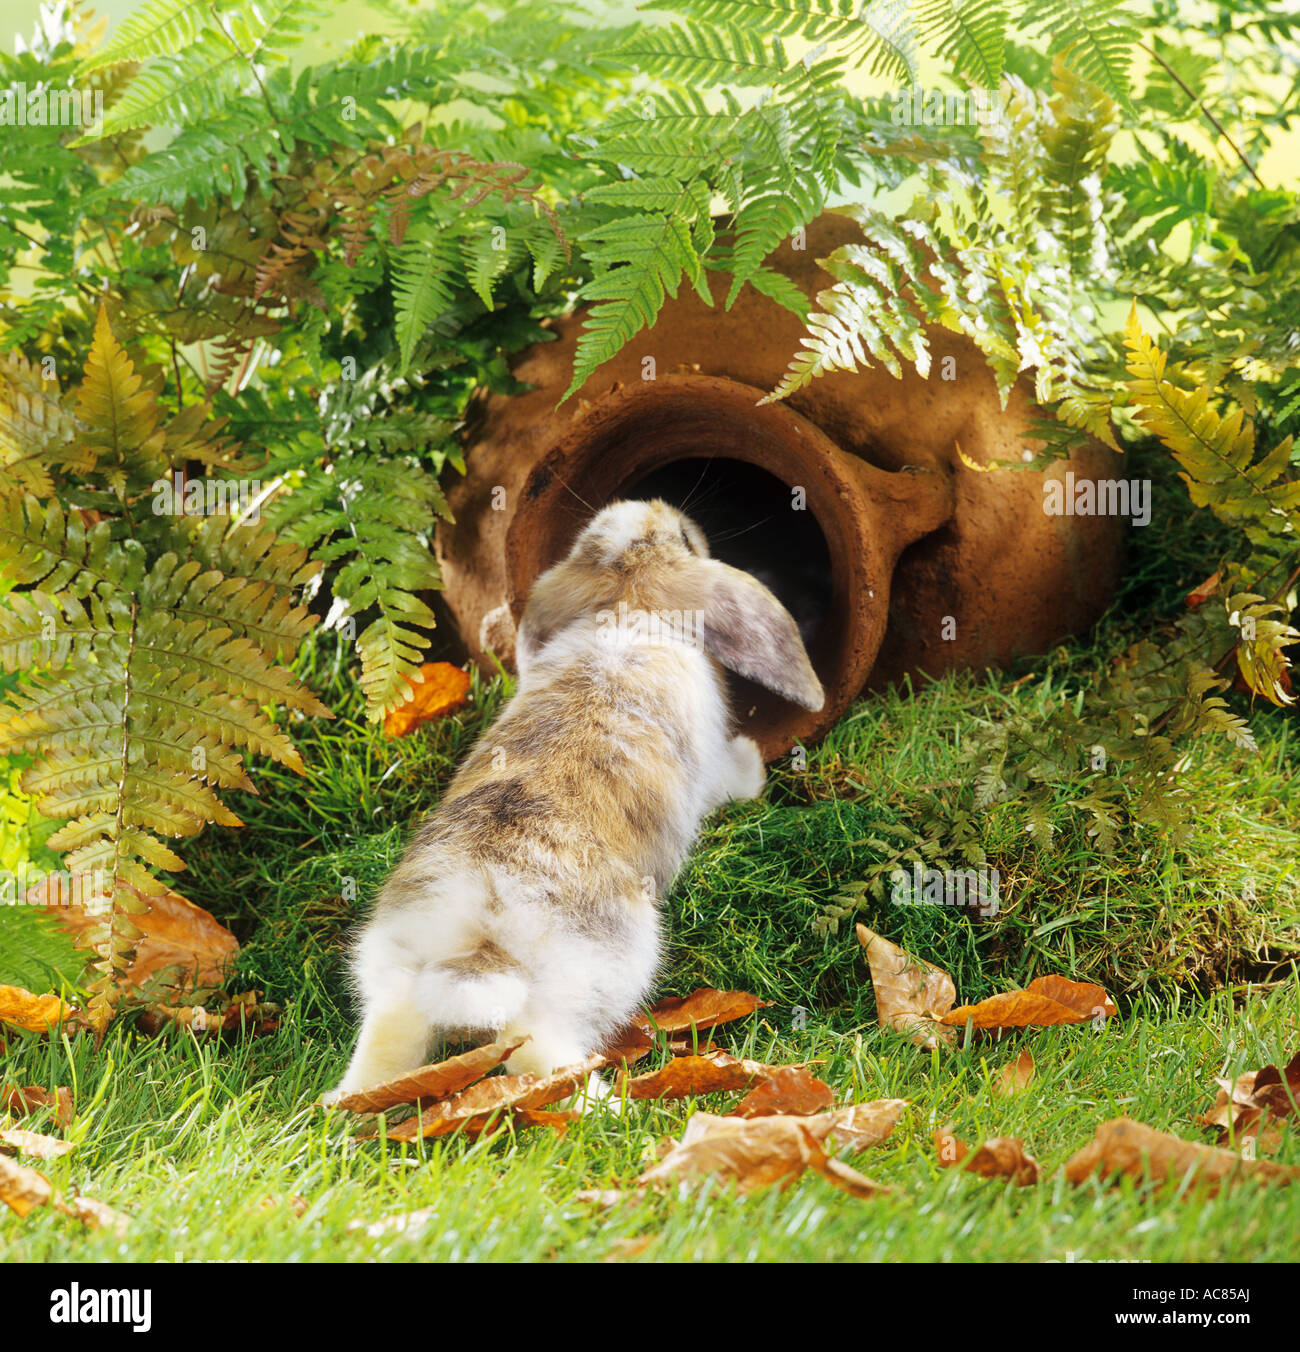 Aoung Pagmy Kaninchen Im Garten Mit Amphore Stockfoto Bild